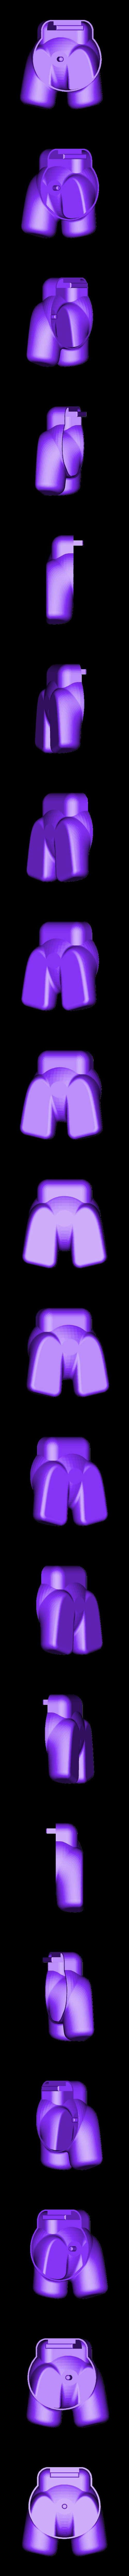 bottom sitting.STL Download STL file Among Us Self Watering Planter • Object to 3D print, JoshuaDomiel